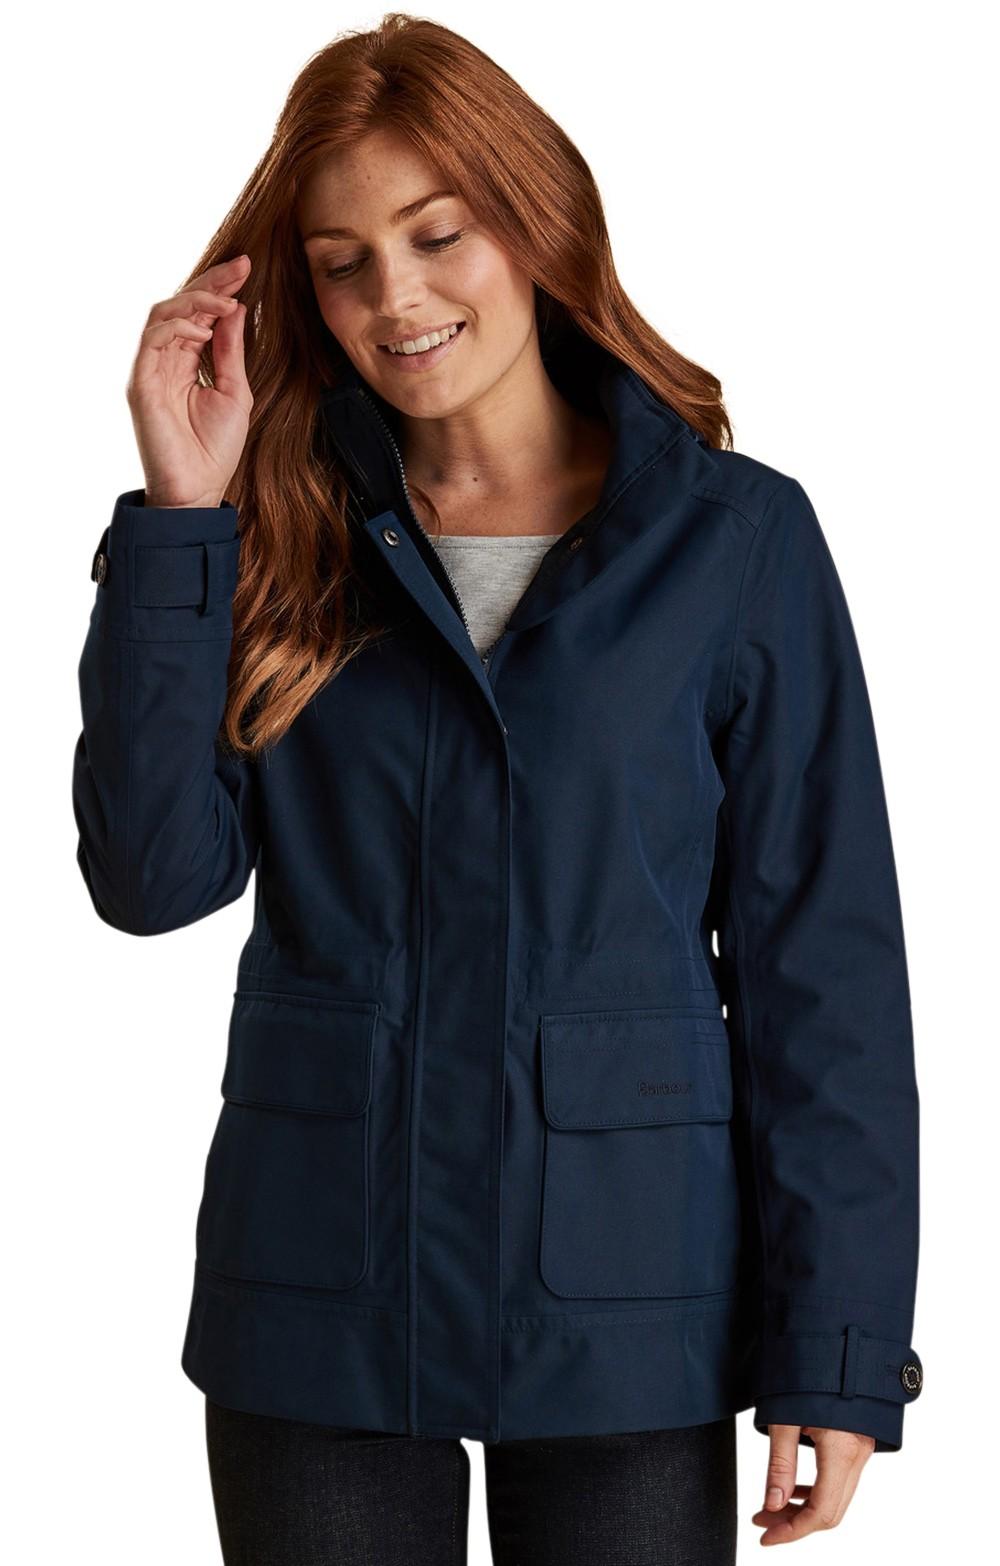 1469281756d12 Ladies Barbour Retreat Jacket